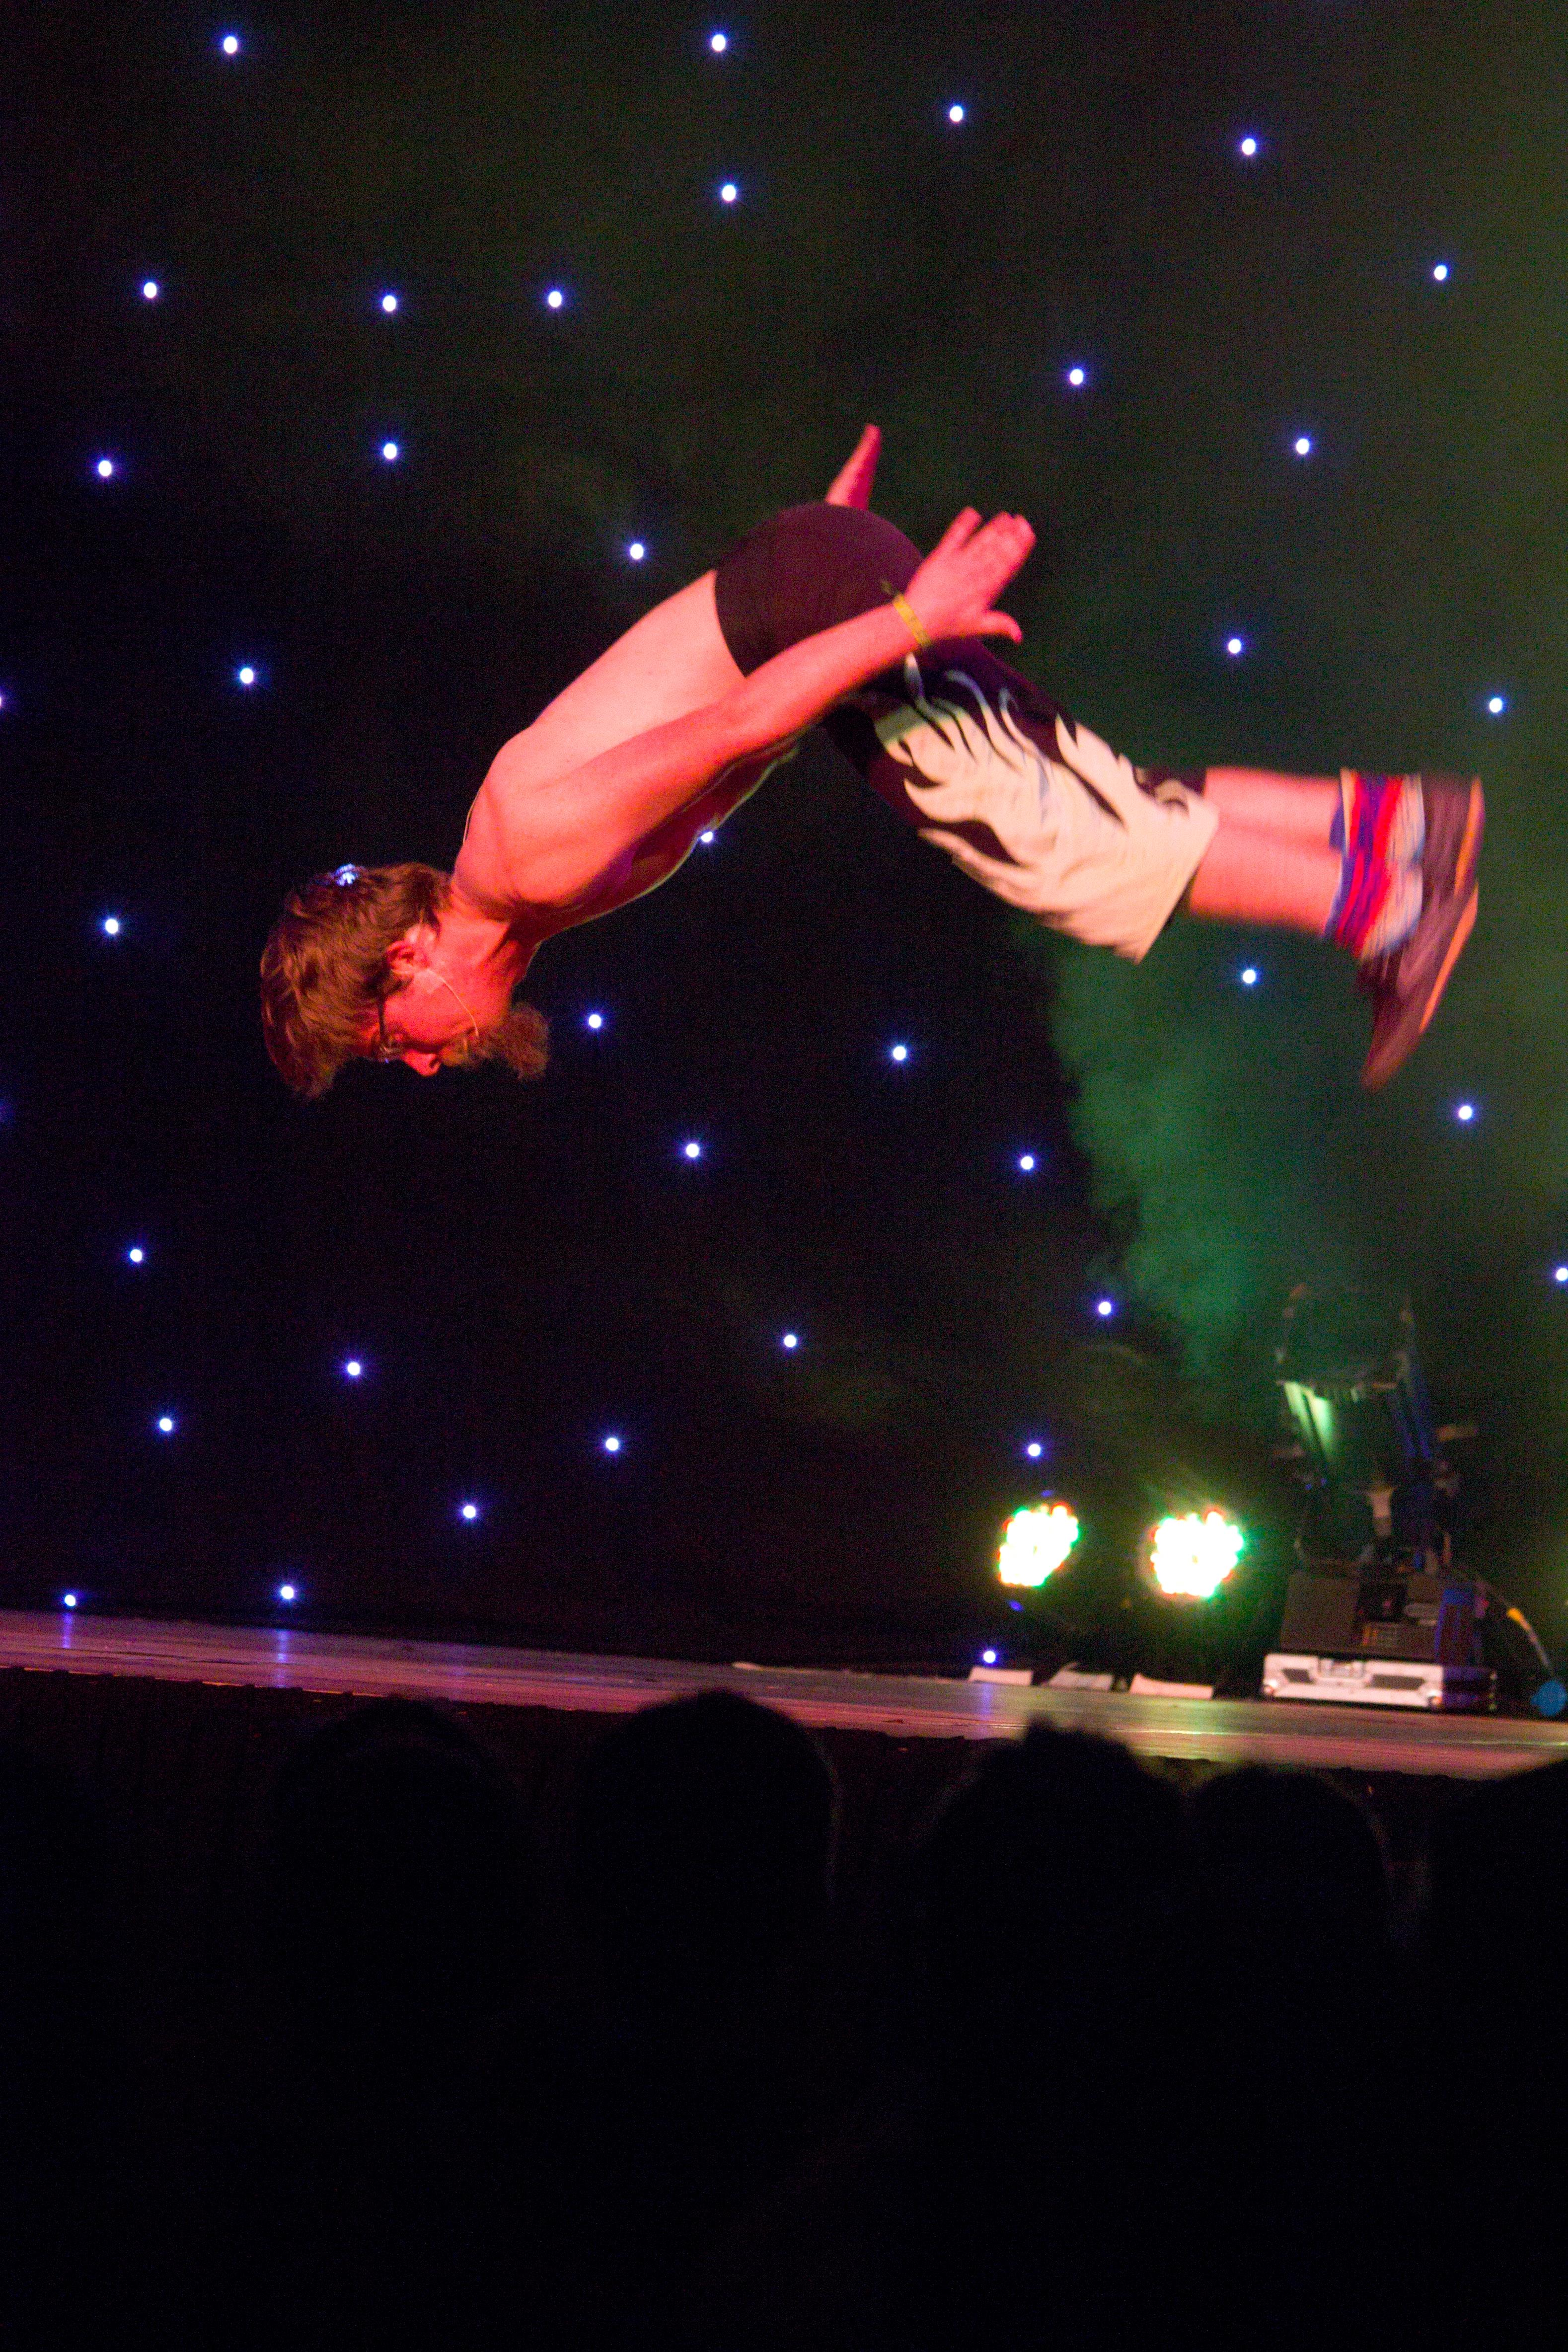 EJC 2014 Millstreet: Open Stage on Saturday 19th July.